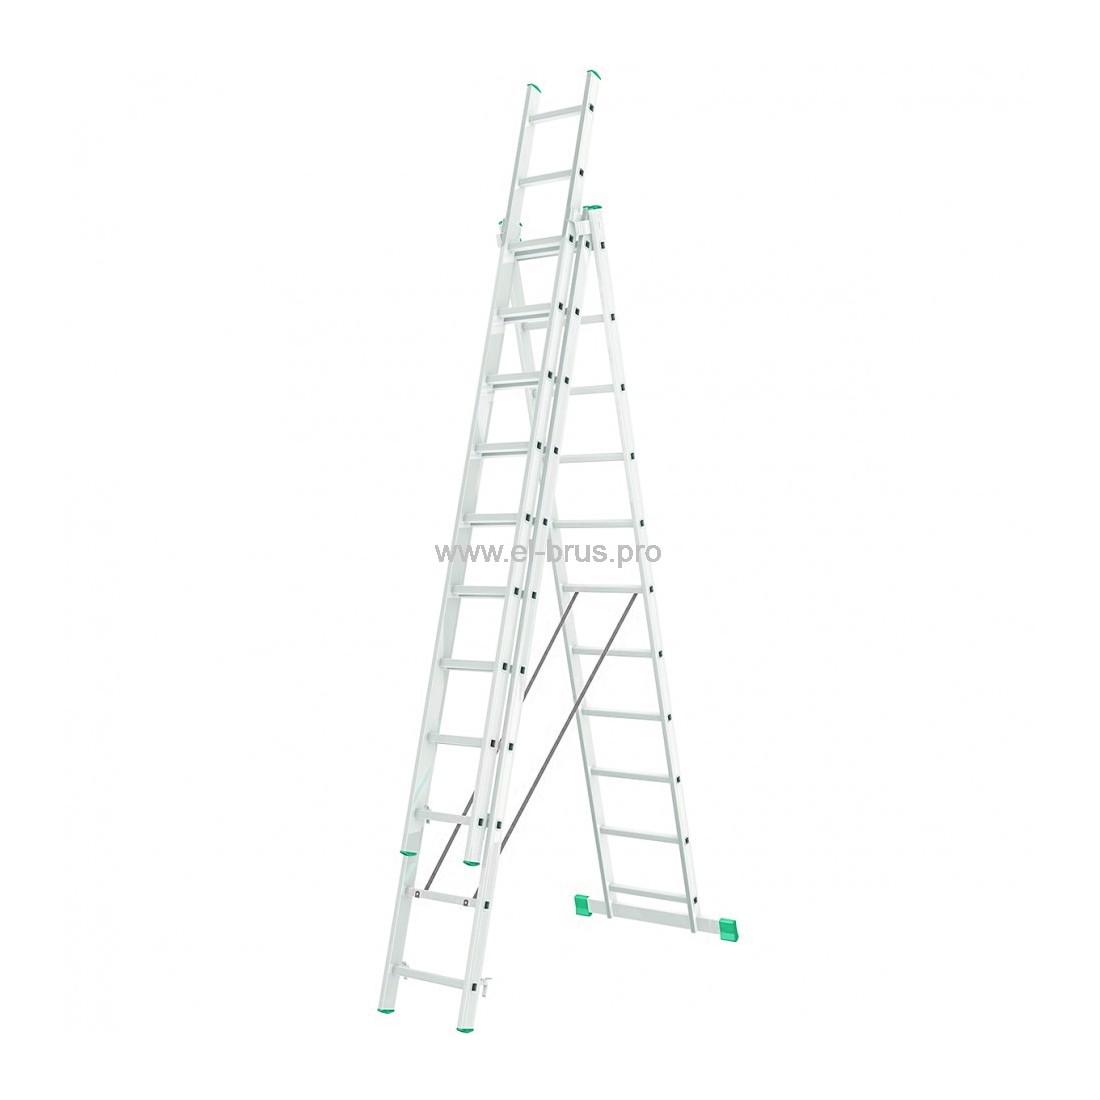 Лестница-стремянка 3-11 трехсекционная LWI